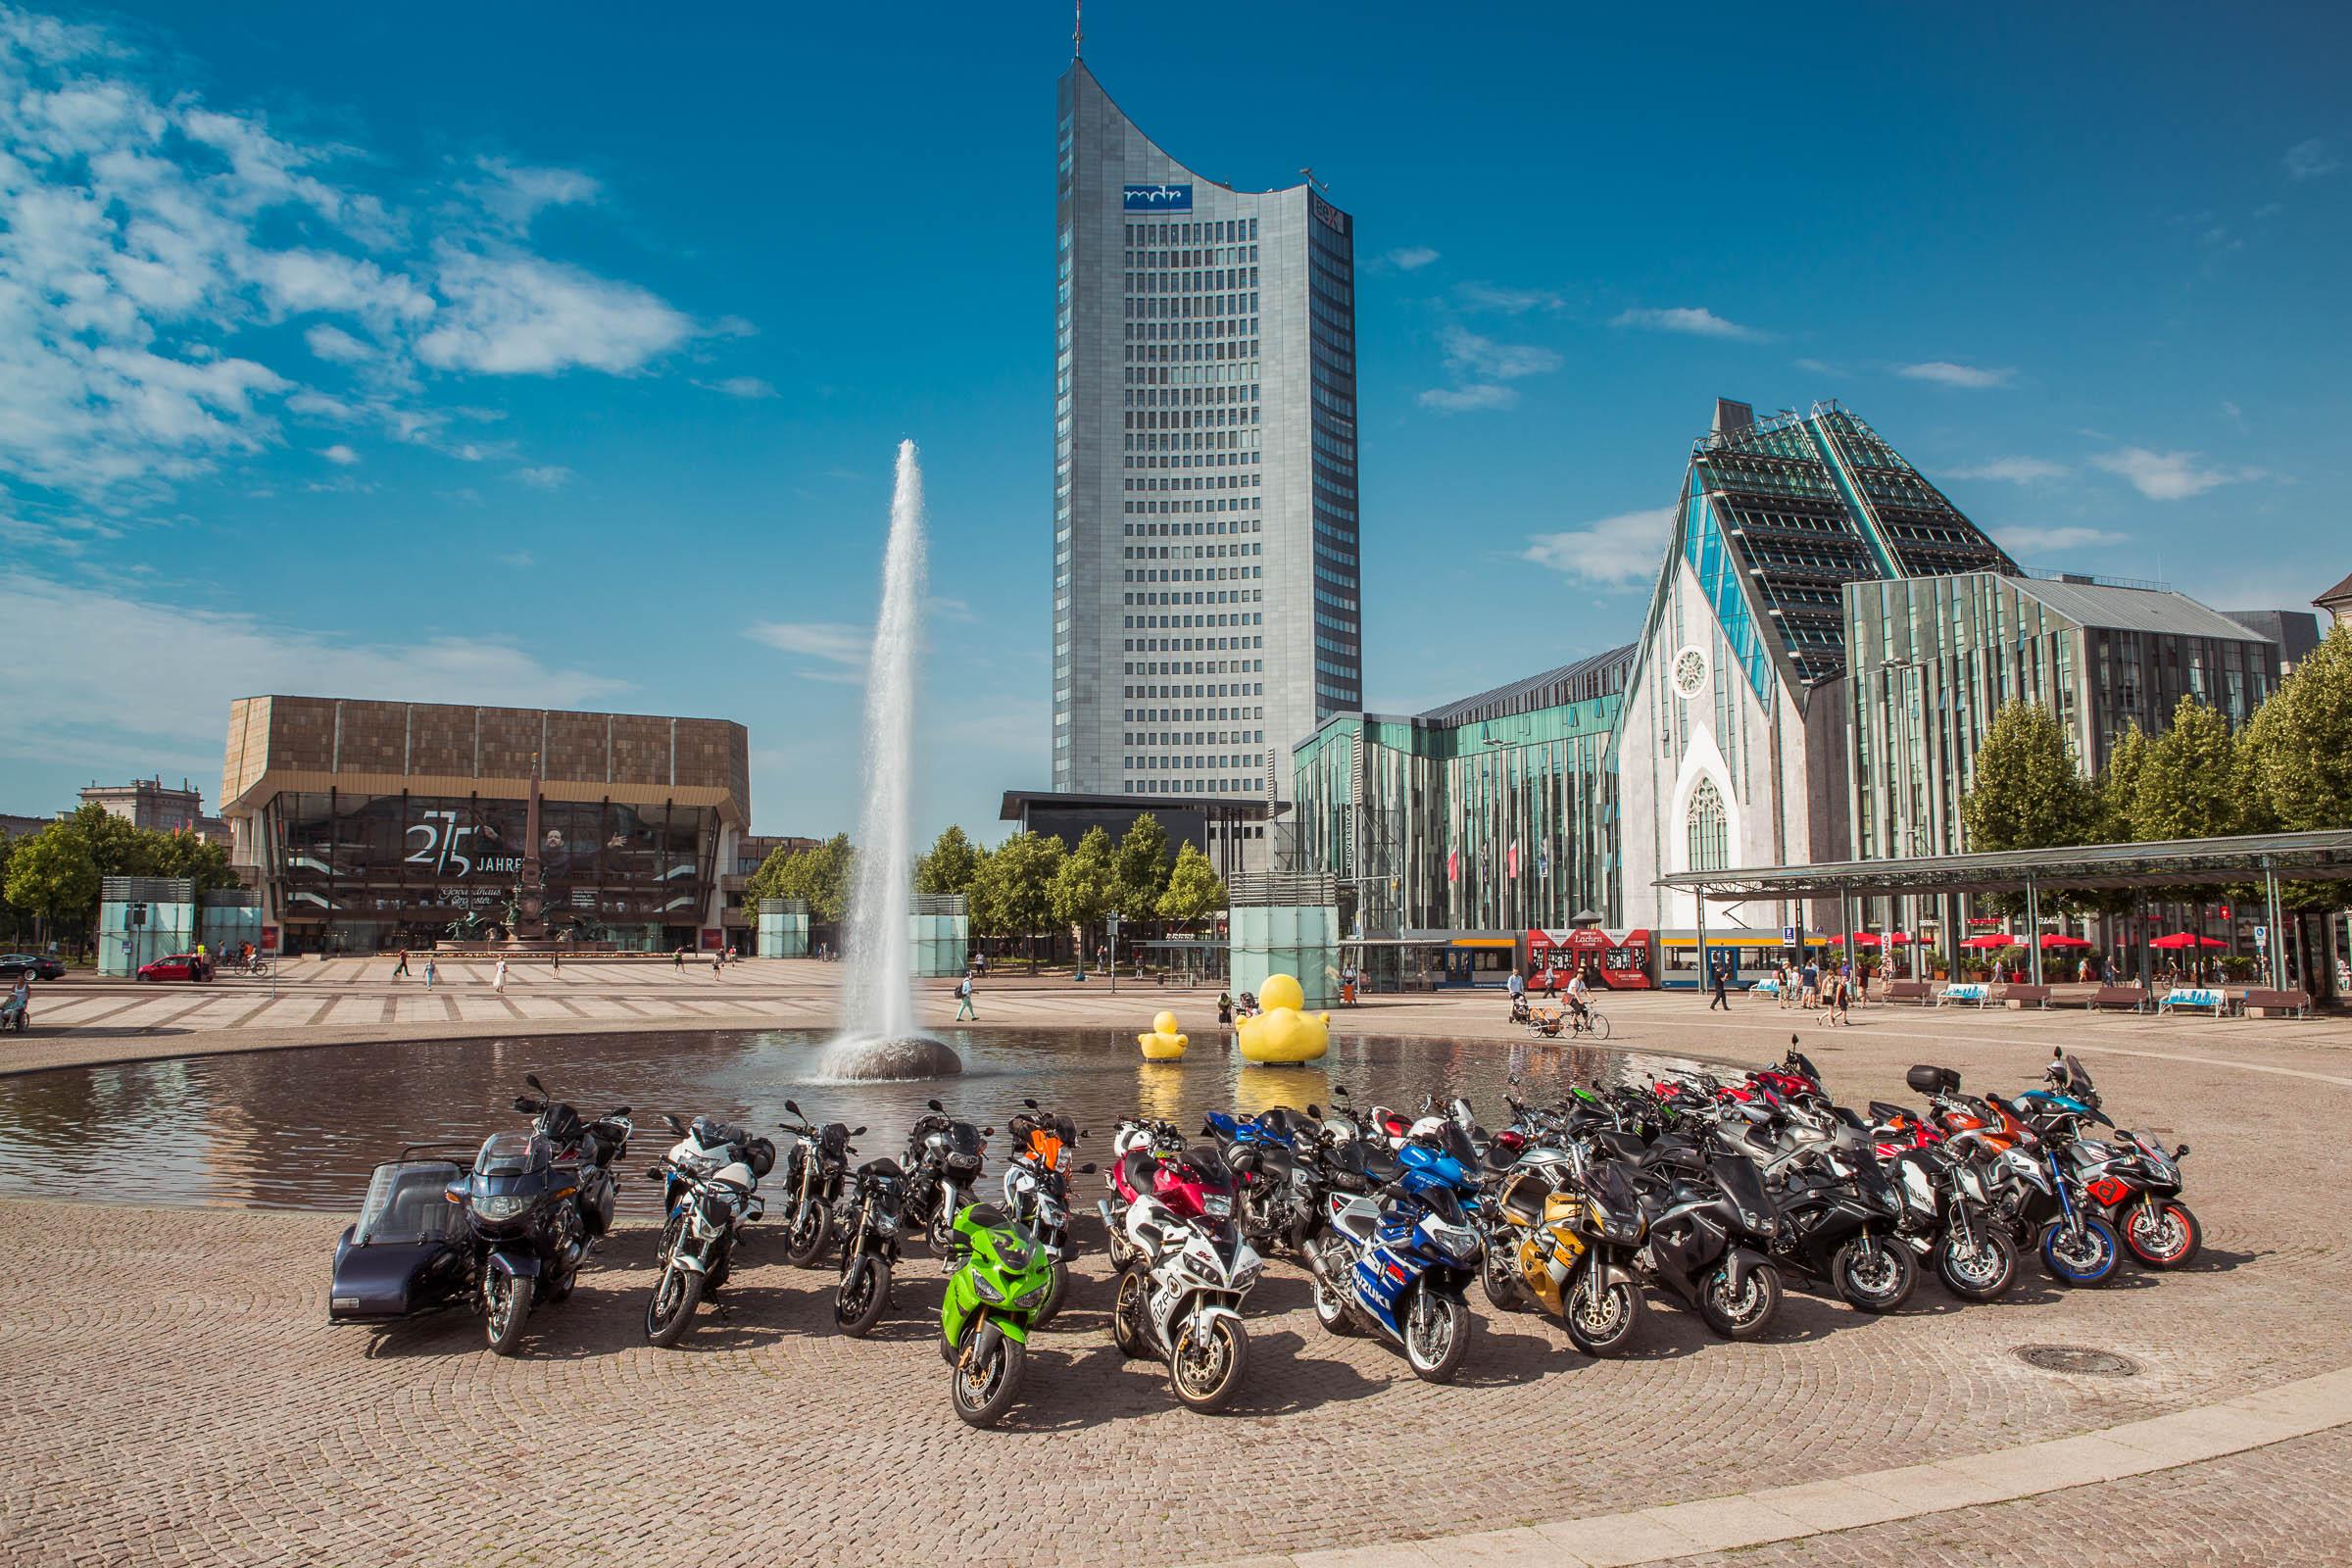 Willkommen bei den Motorradfreunden